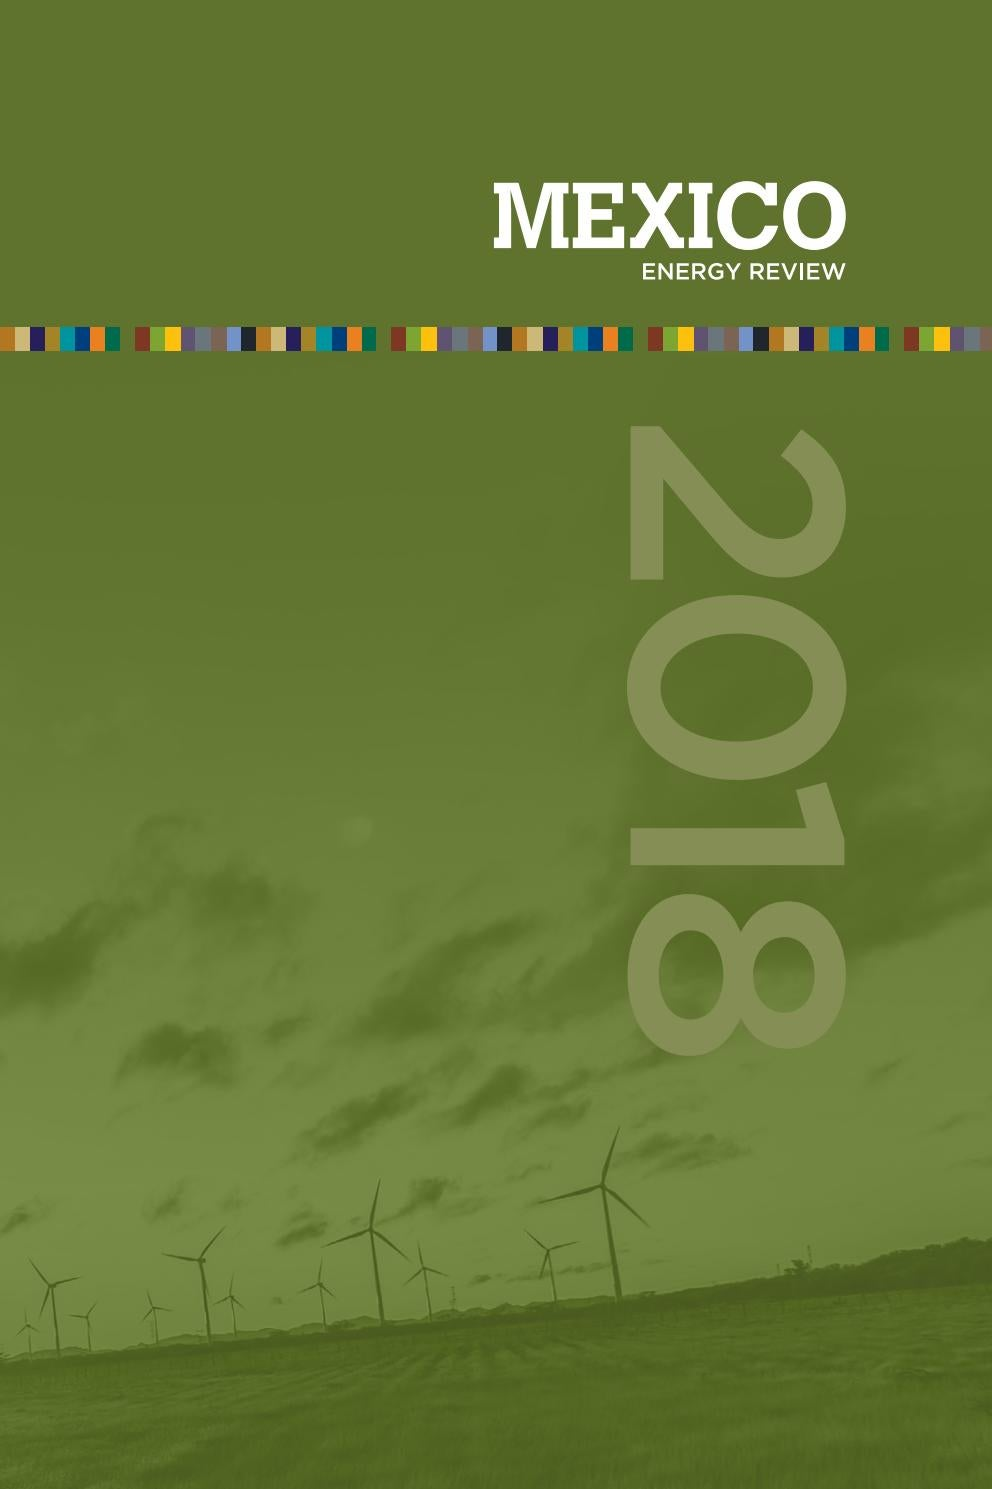 medium resolution of mexico energy review 2018